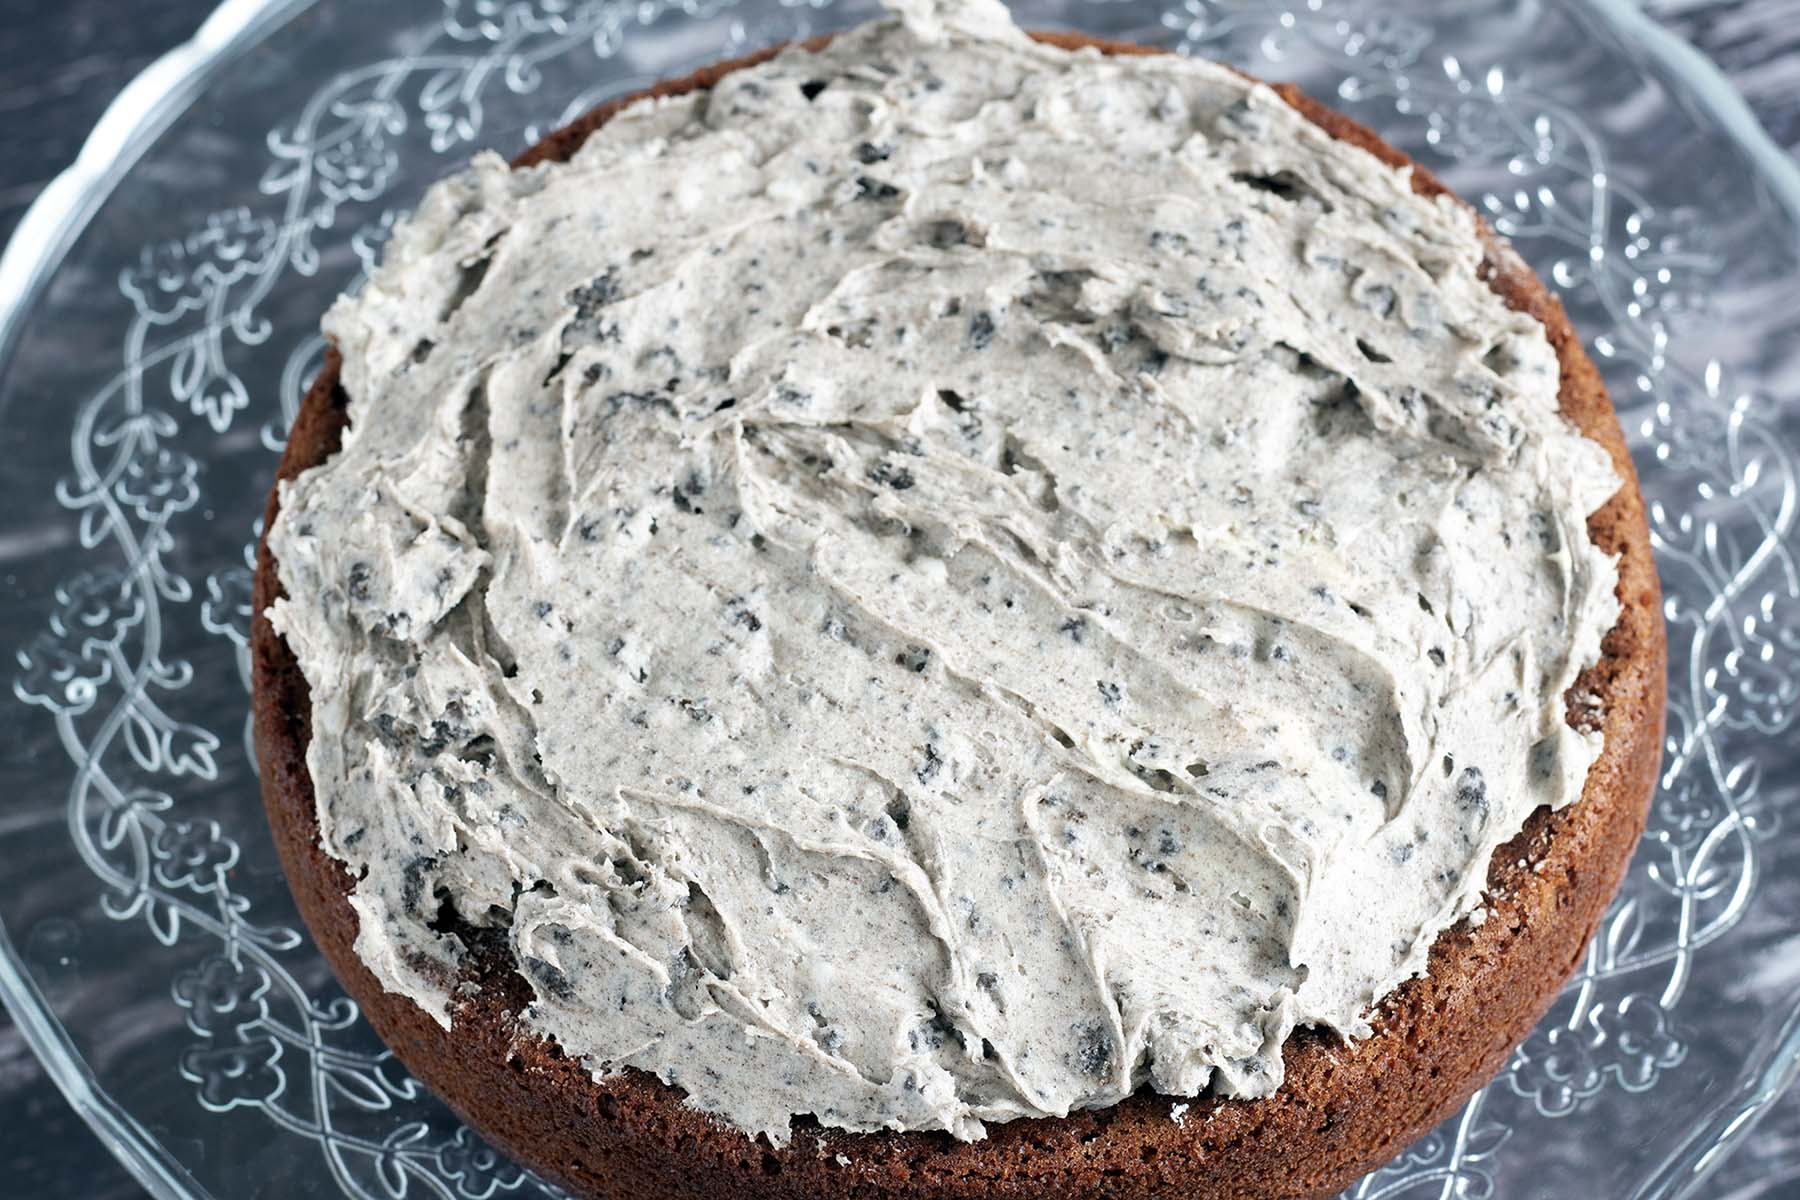 vegan sandwich cake with frosting on bottom tier